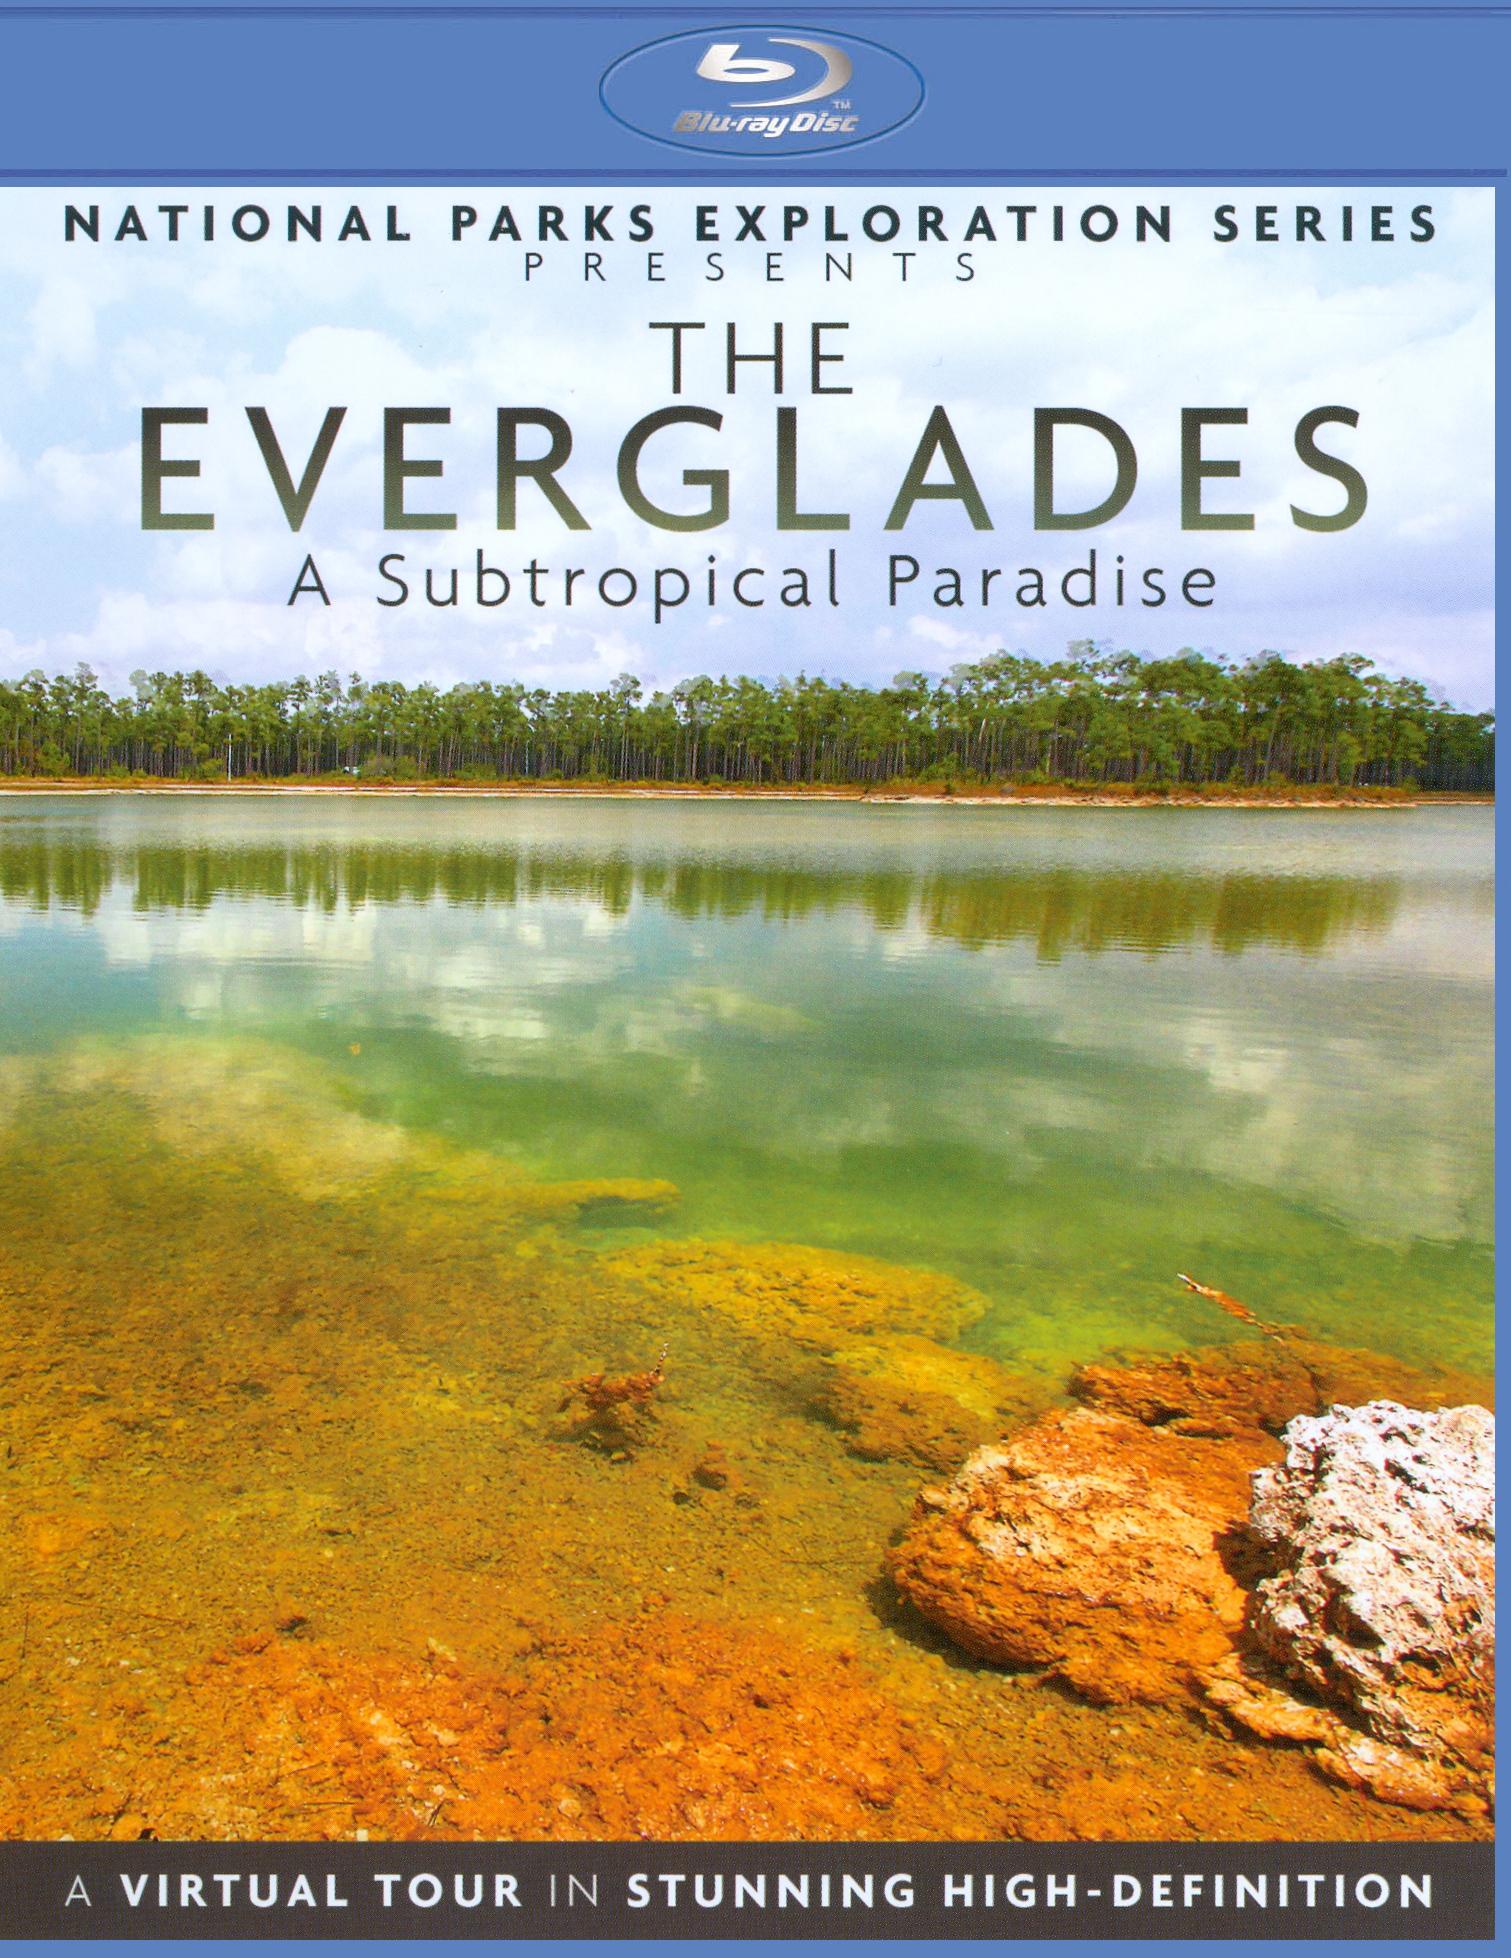 The Everglades: A Subtropical Paradise